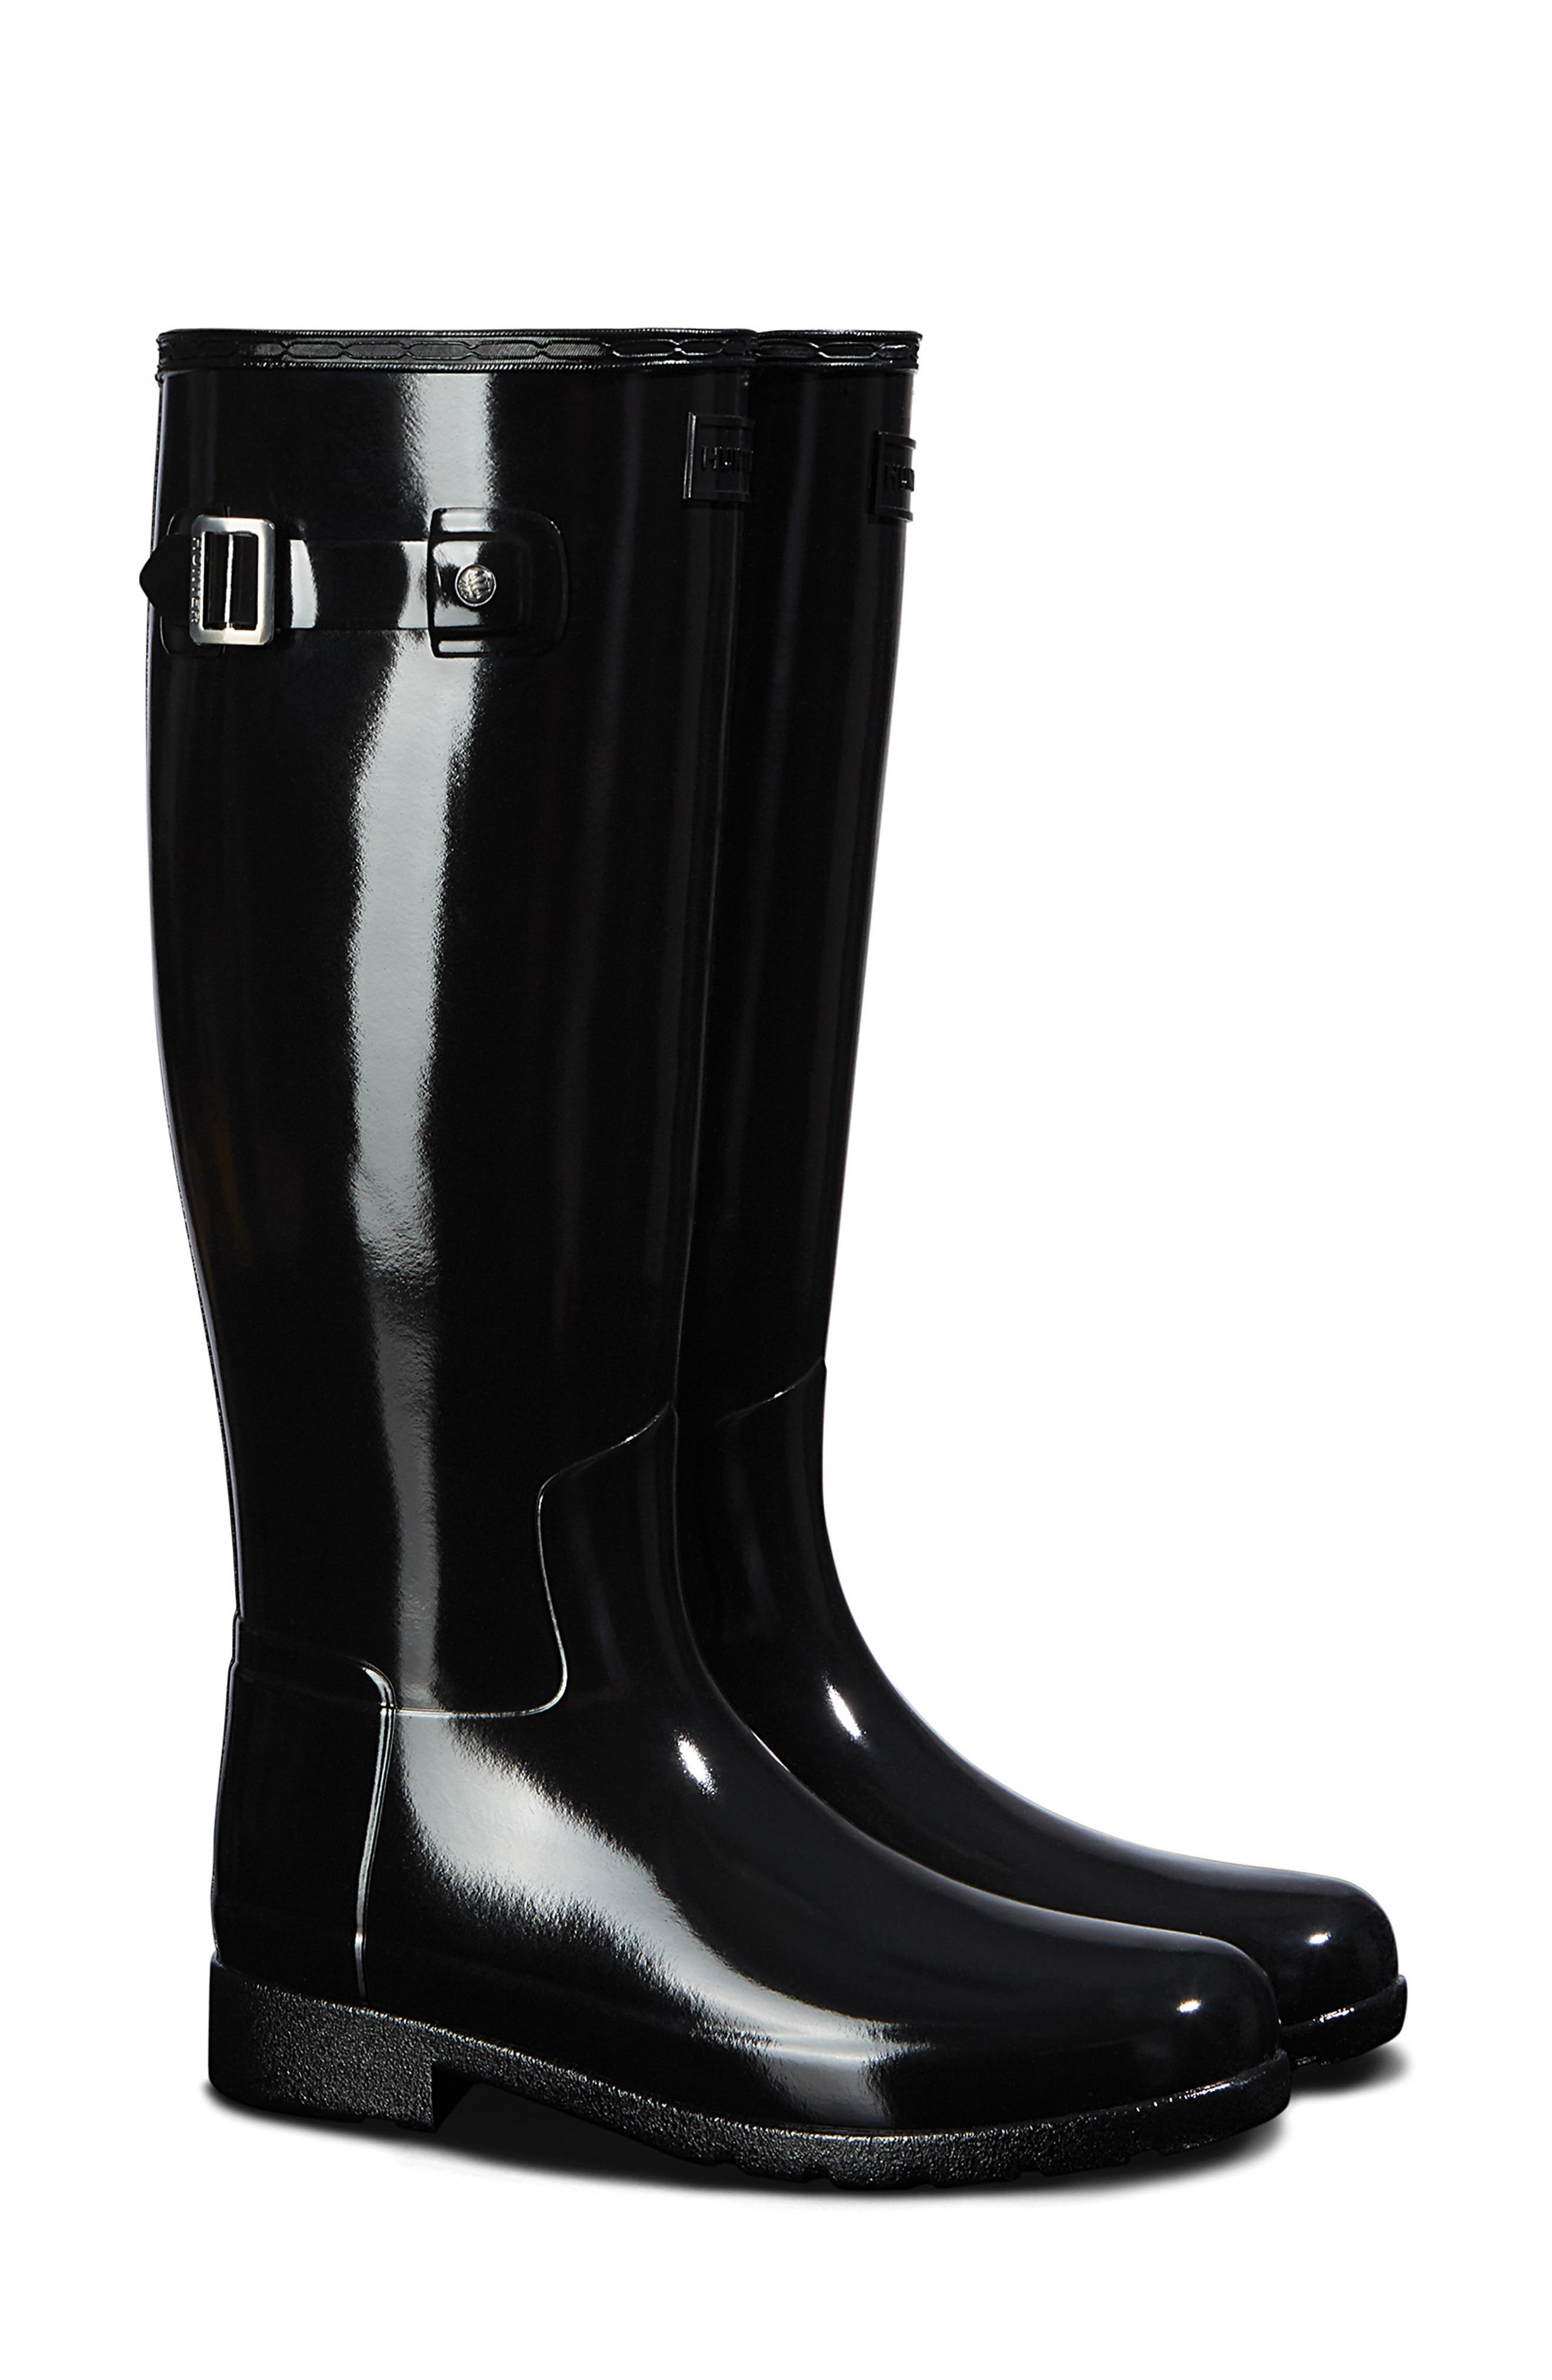 HUNTER Original Refined Gloss Tall Waterproof Rain Boot, Main, color, BLACK